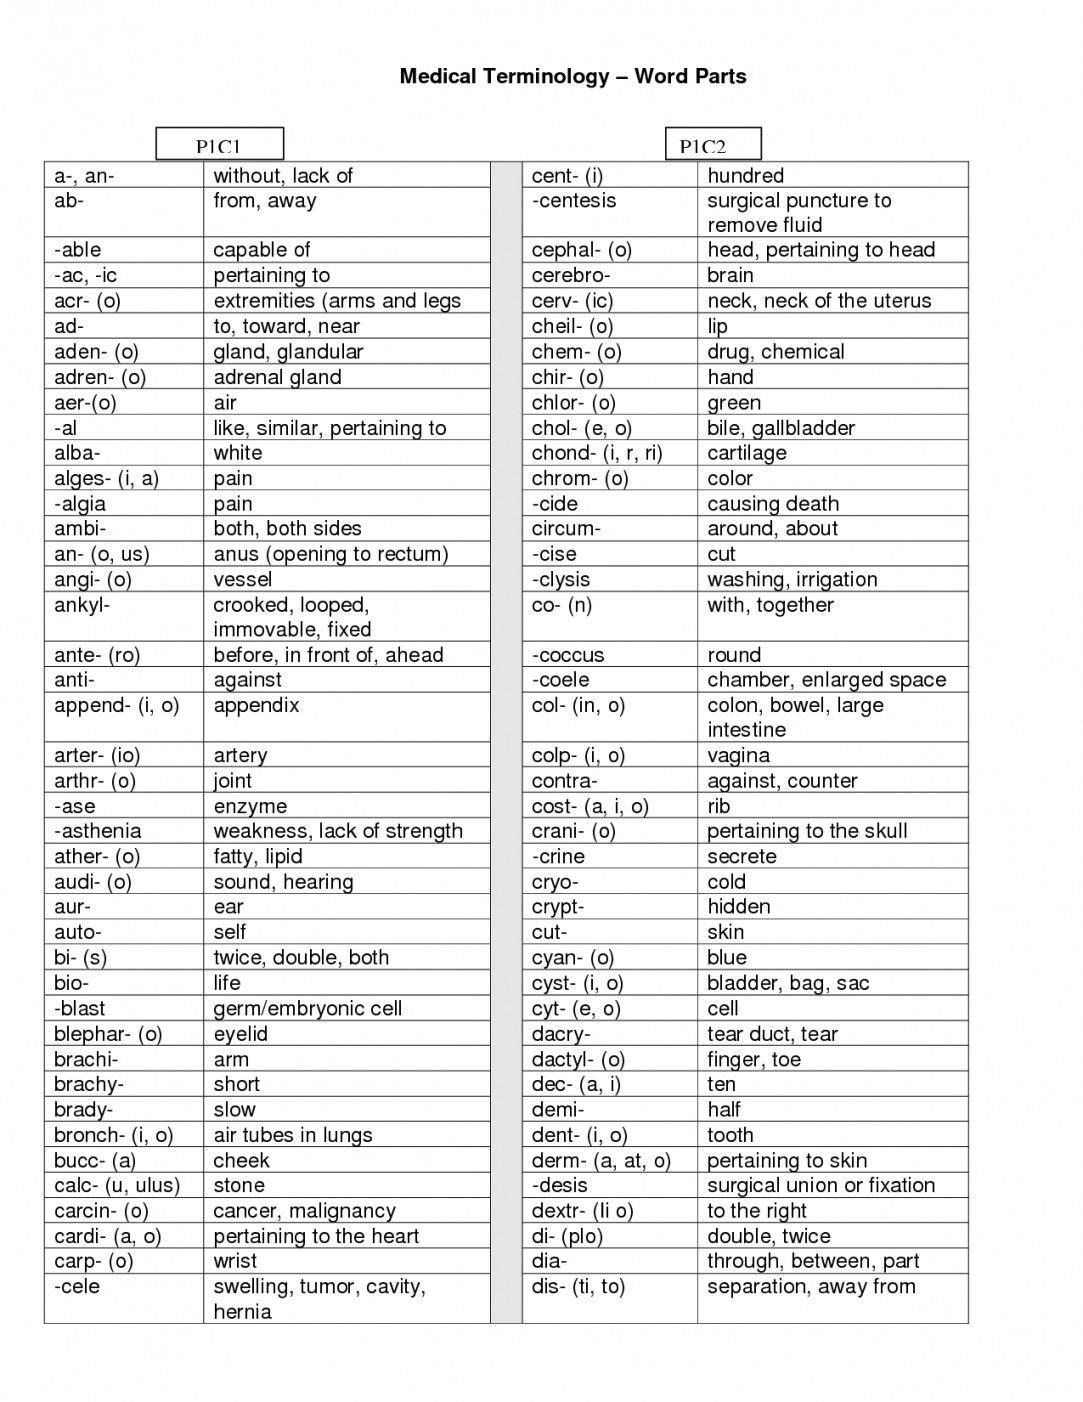 Medical Terminology Prefixes Worksheet  Yooob As Well As Medical Terminology Prefixes Worksheet